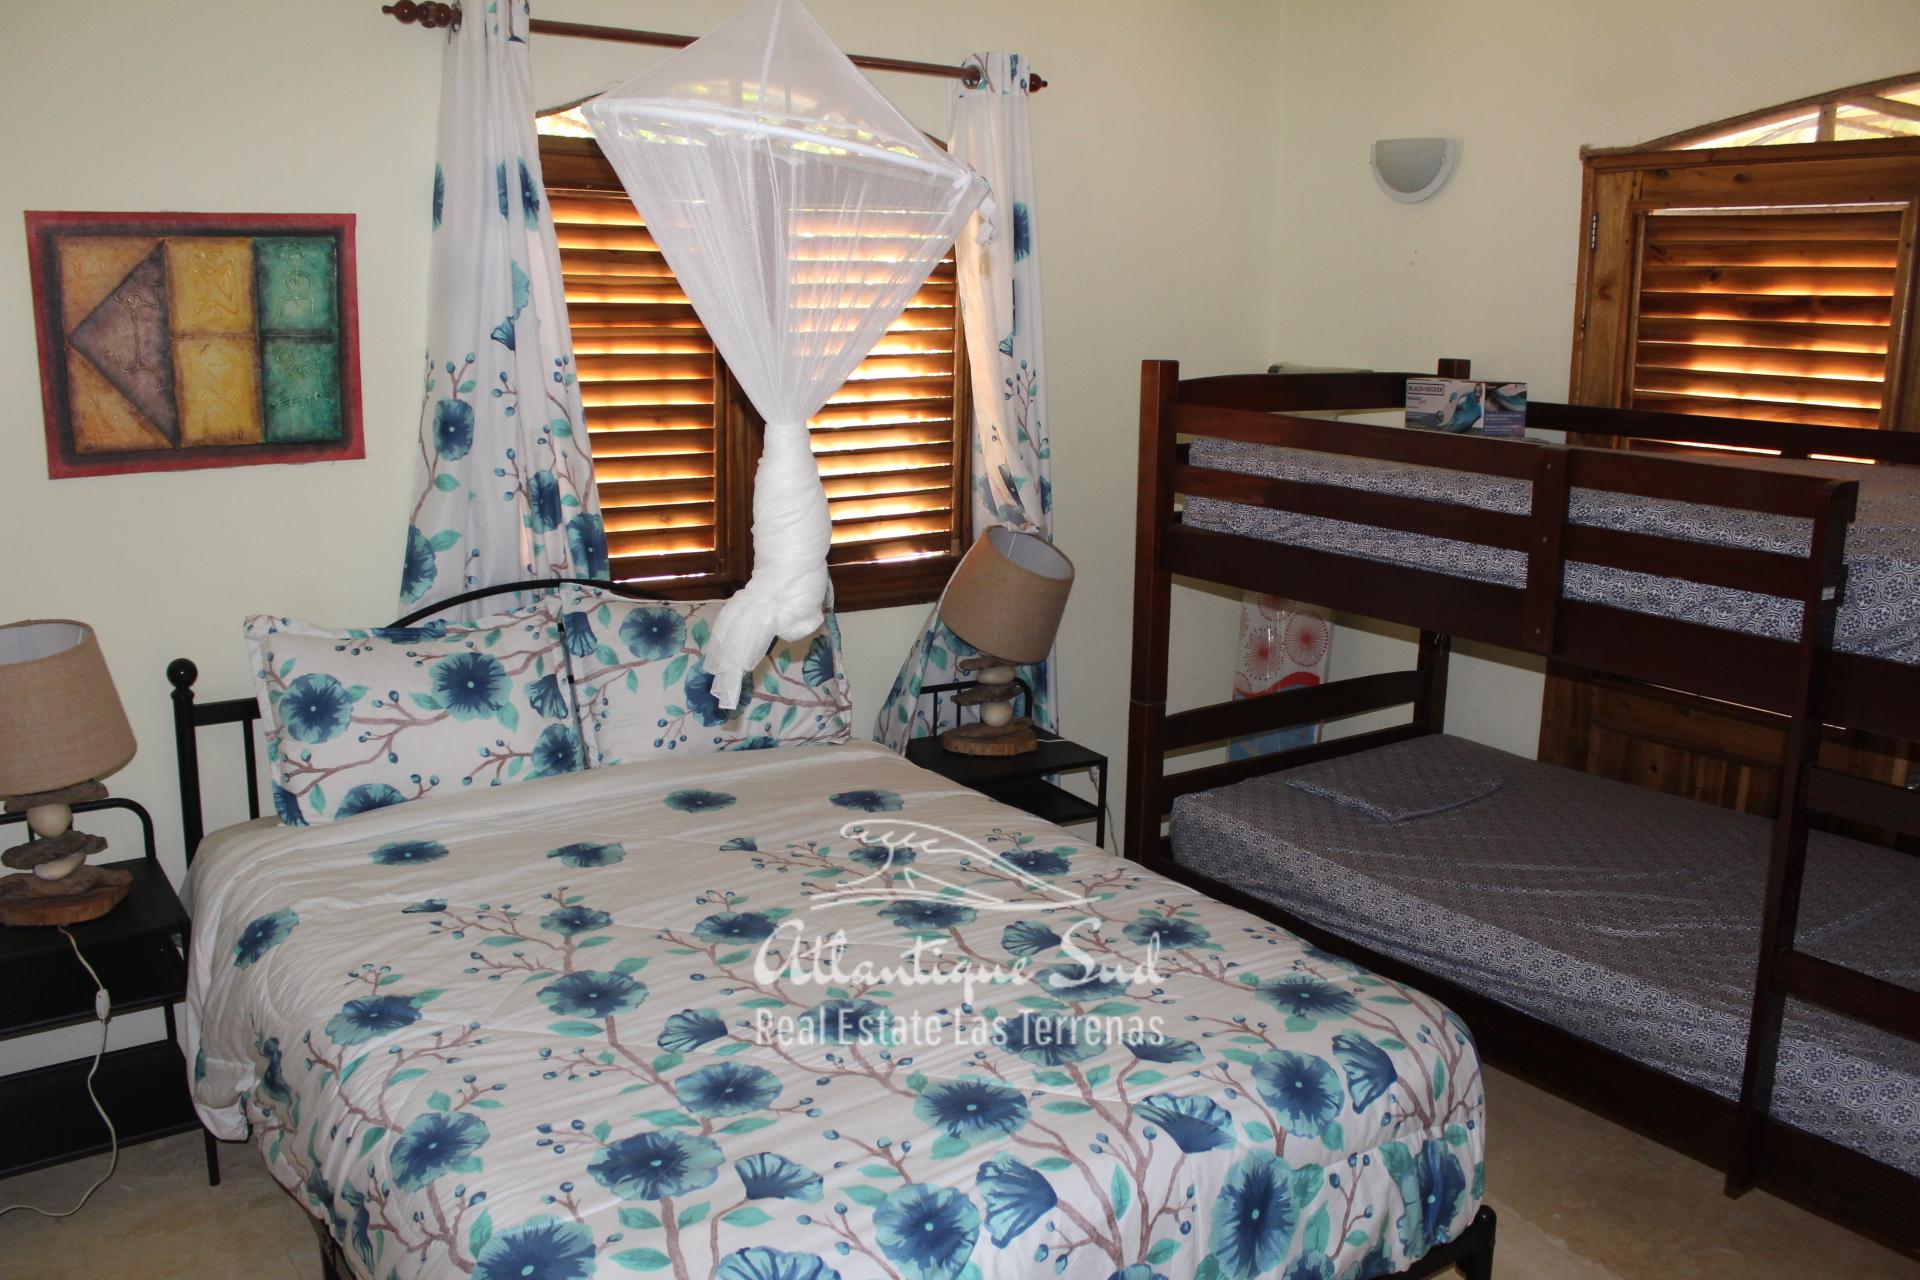 2 carribean villas minutes to the beach Real Estate Las Terrenas Dominican Republic Atlantique Sud11.jpg